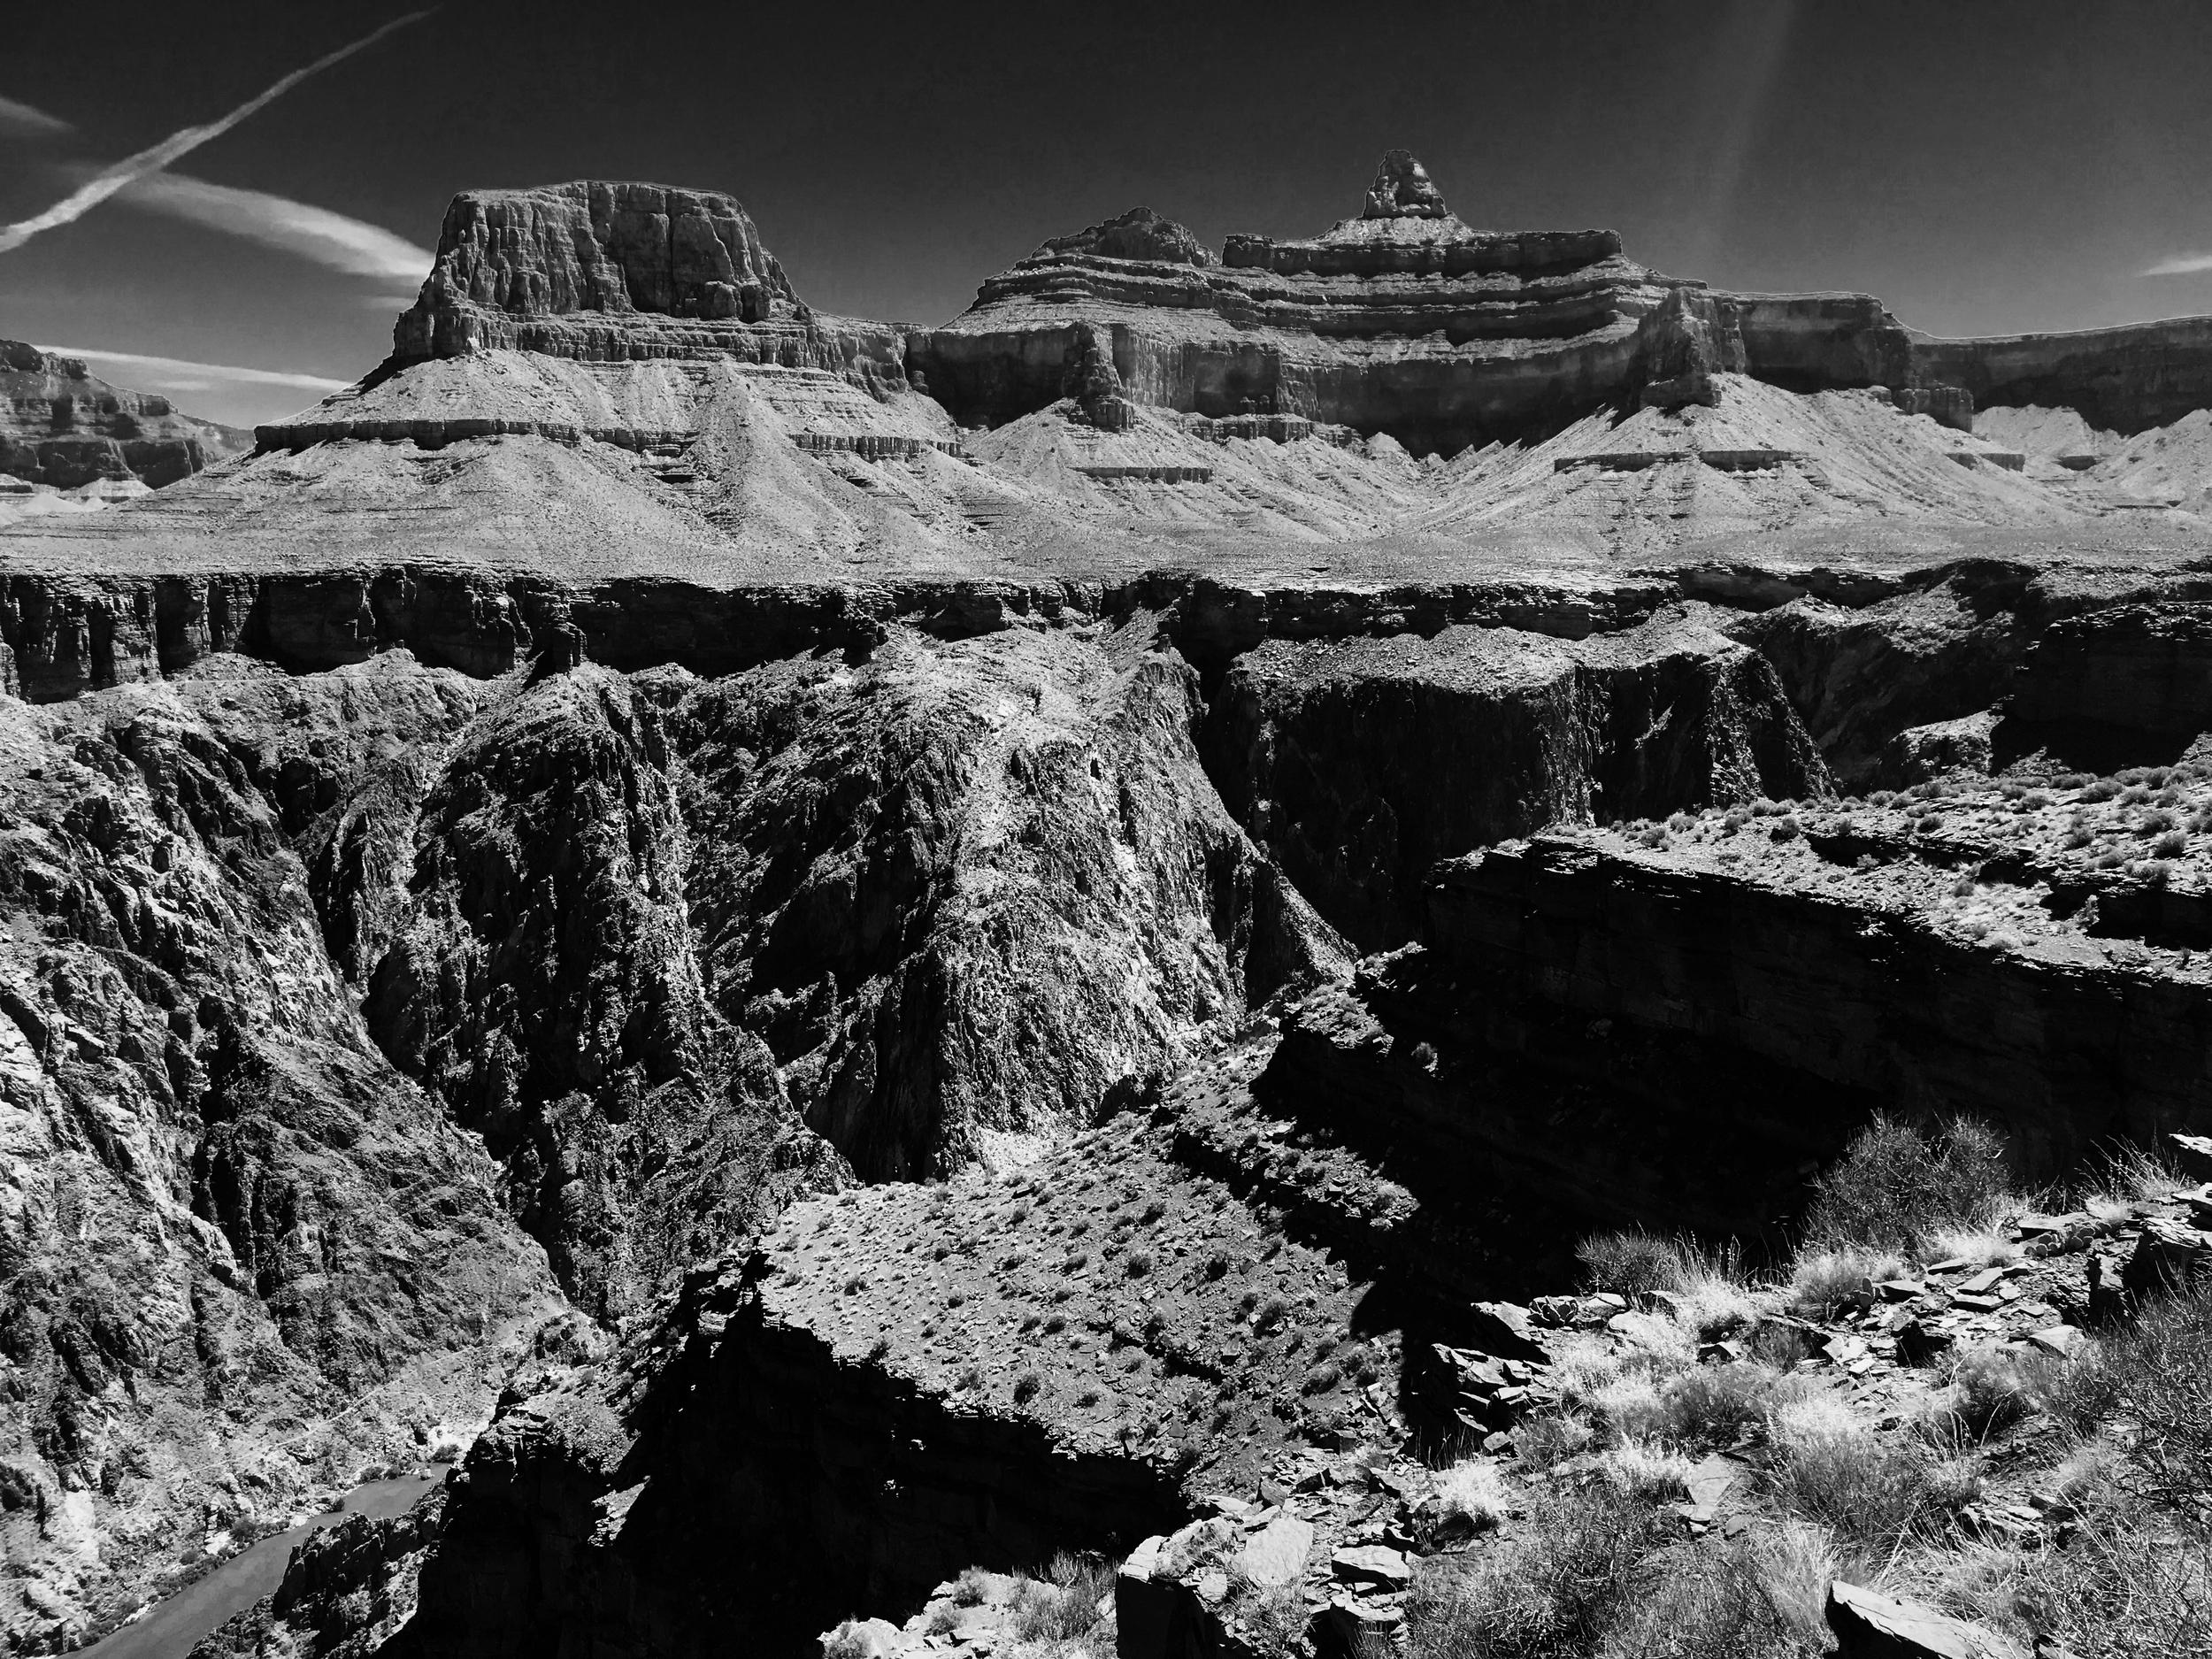 Grand Canyon BW tip of river.jpg